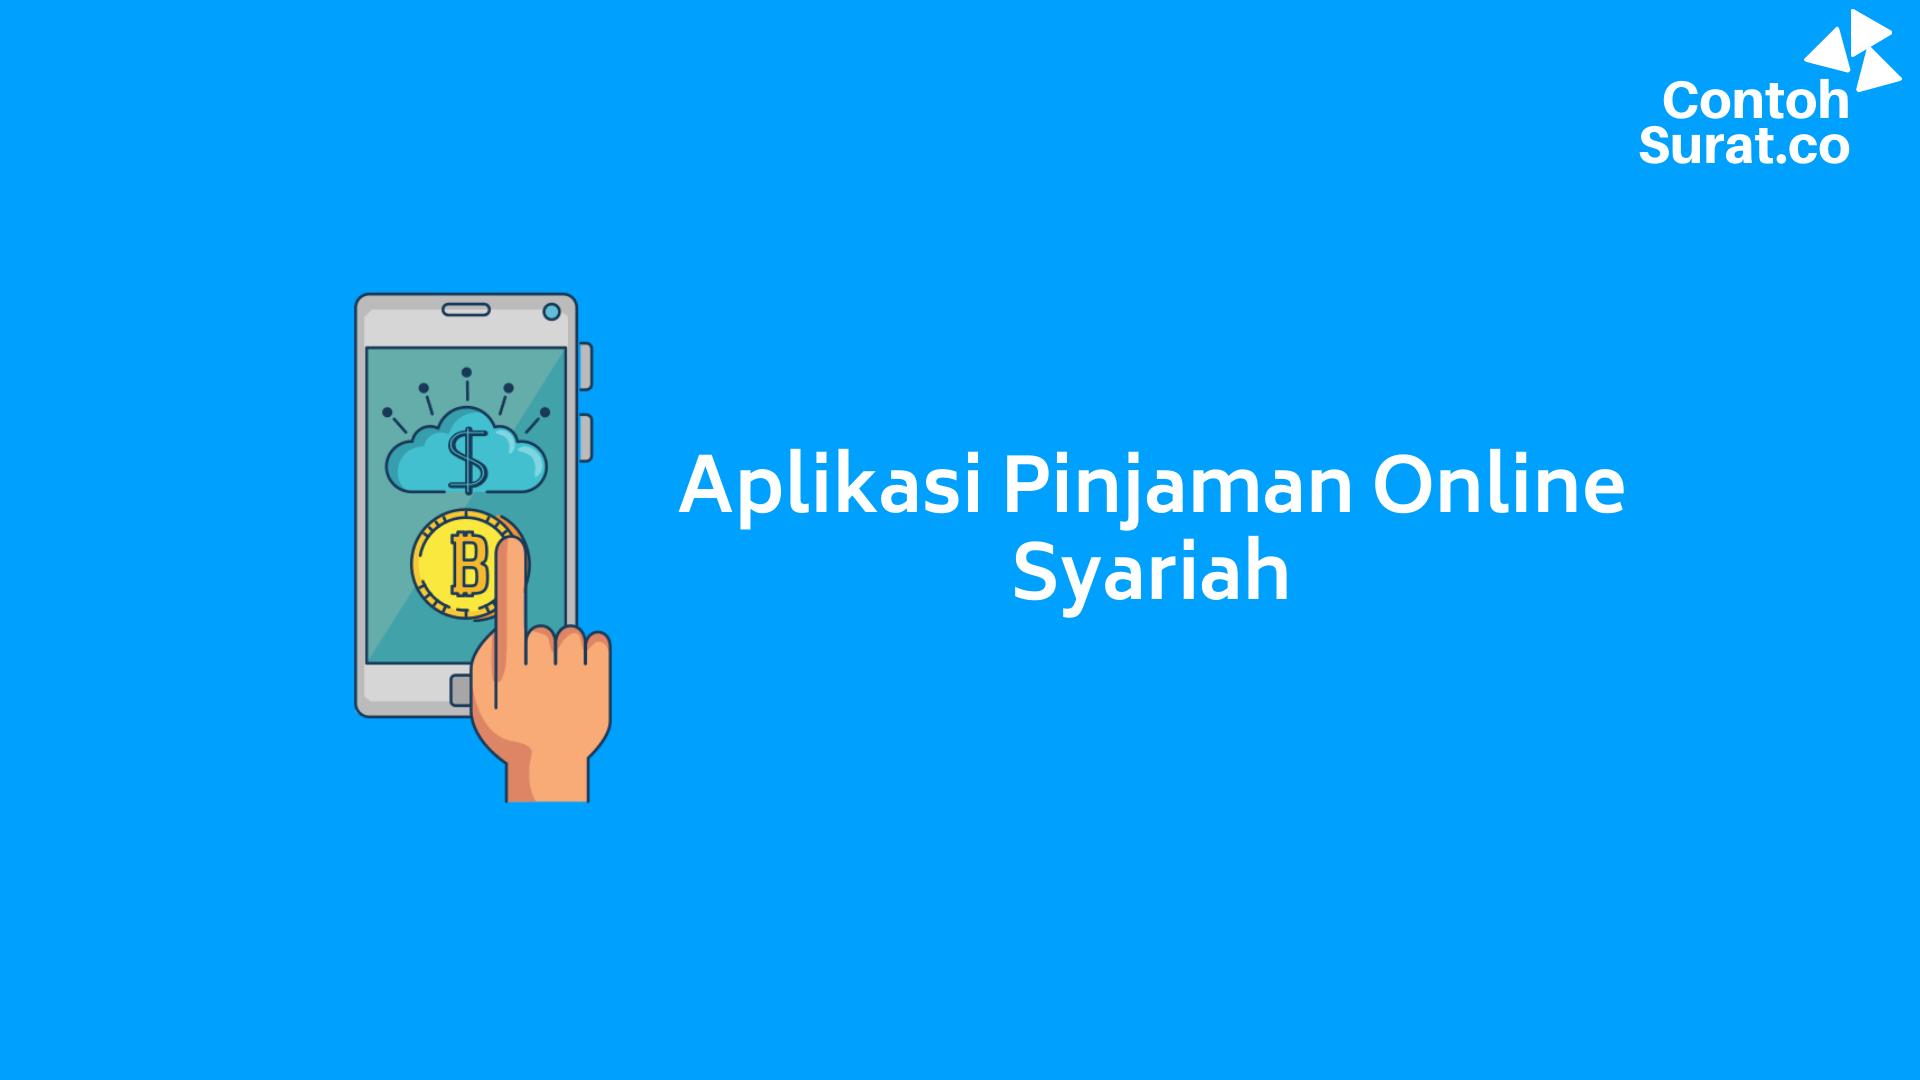 Daftar Aplikasi Pinjaman Online Syariah